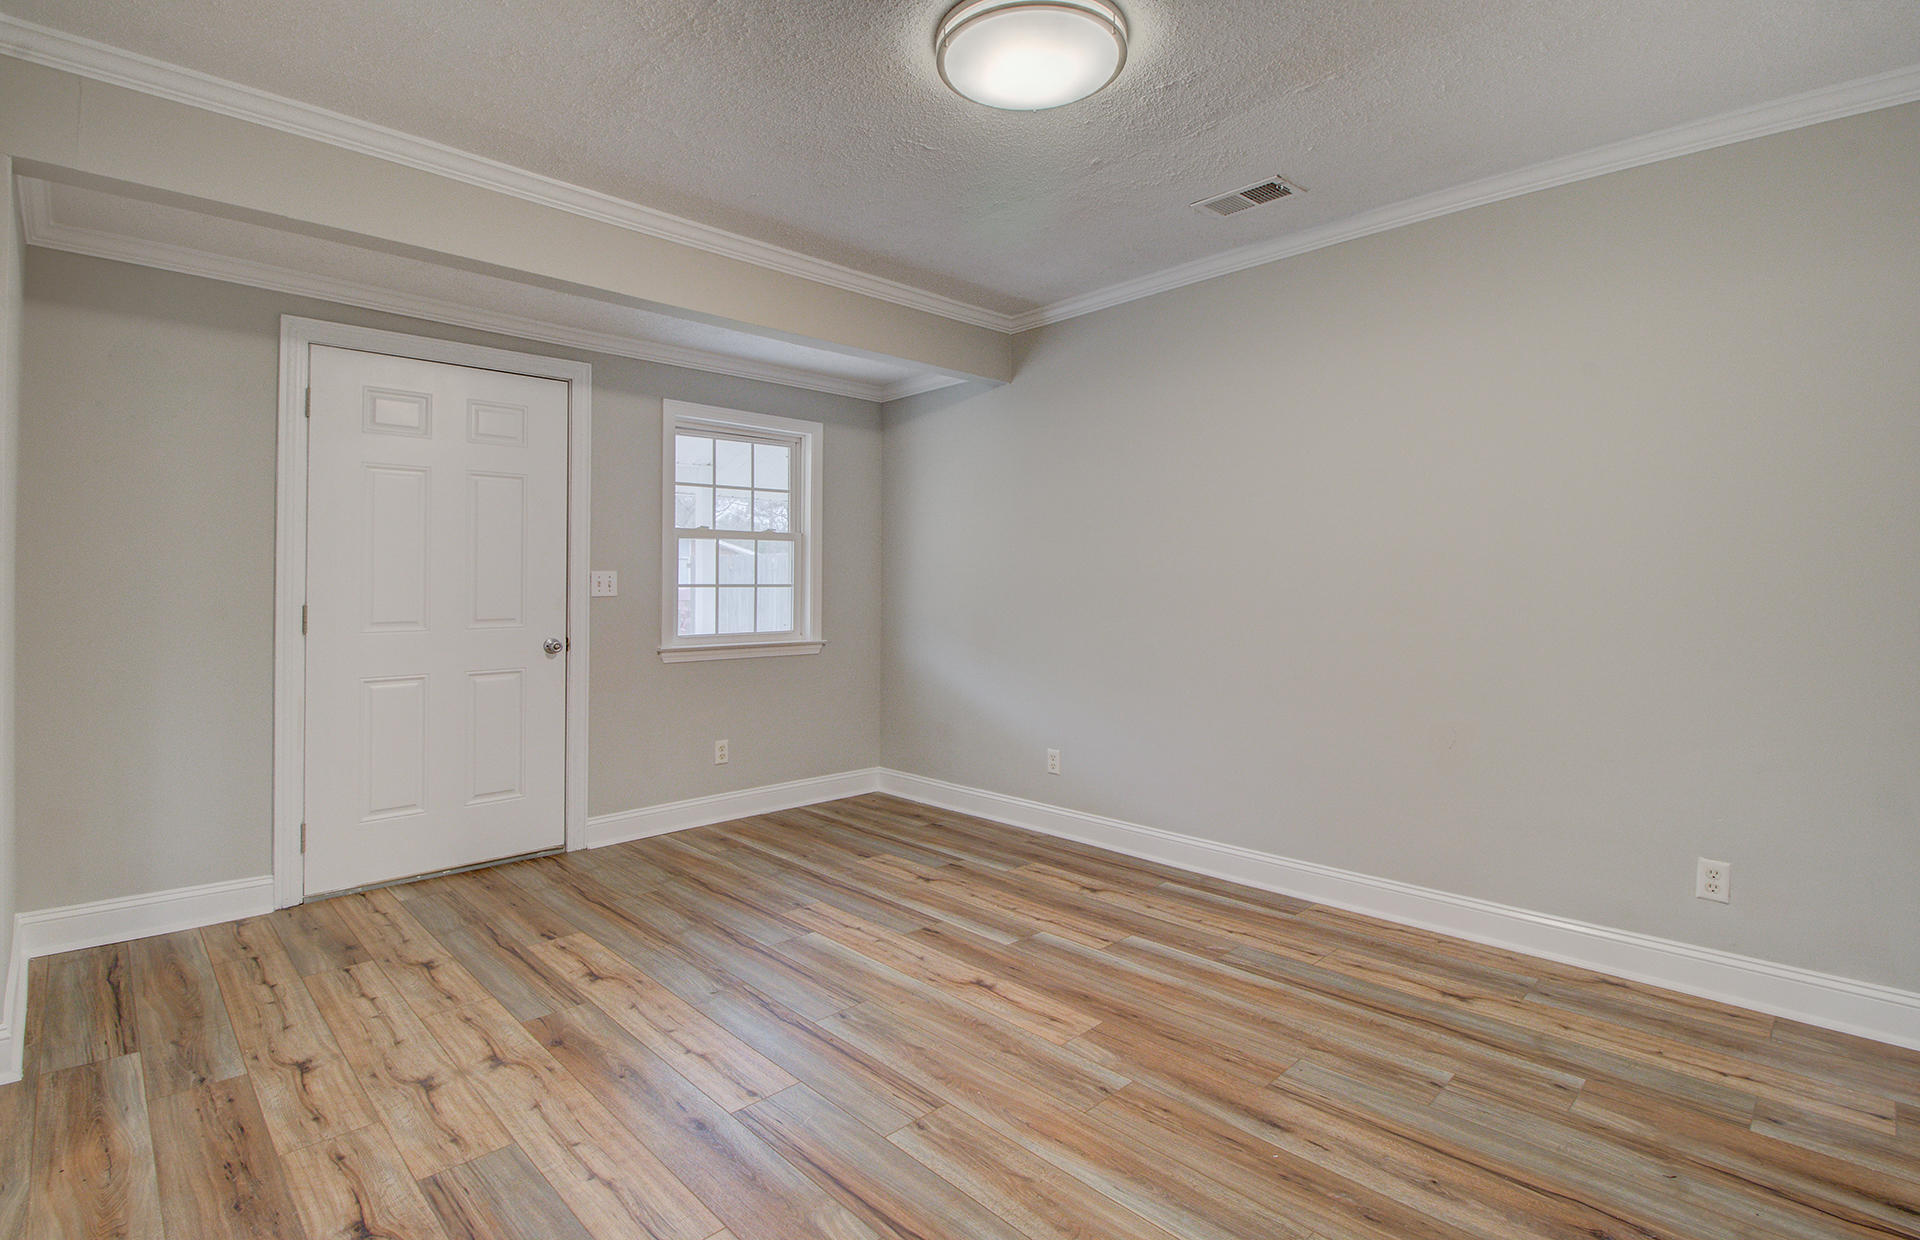 Sedgefield Section I Homes For Sale - 30 Aldene, Goose Creek, SC - 23